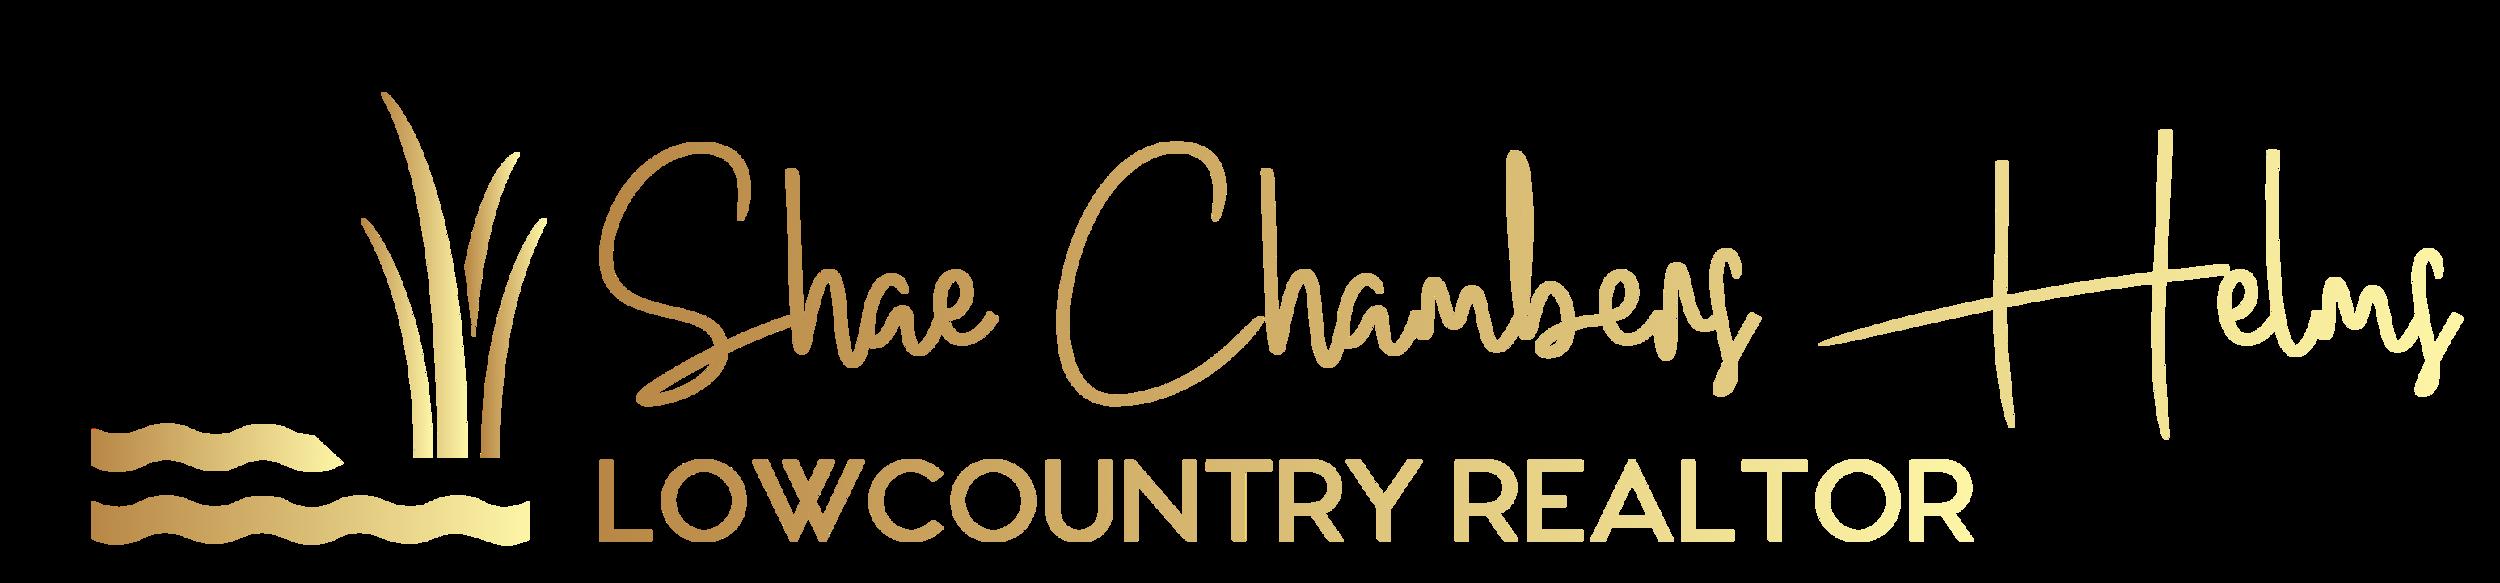 Shae-Chambers-Logo.png